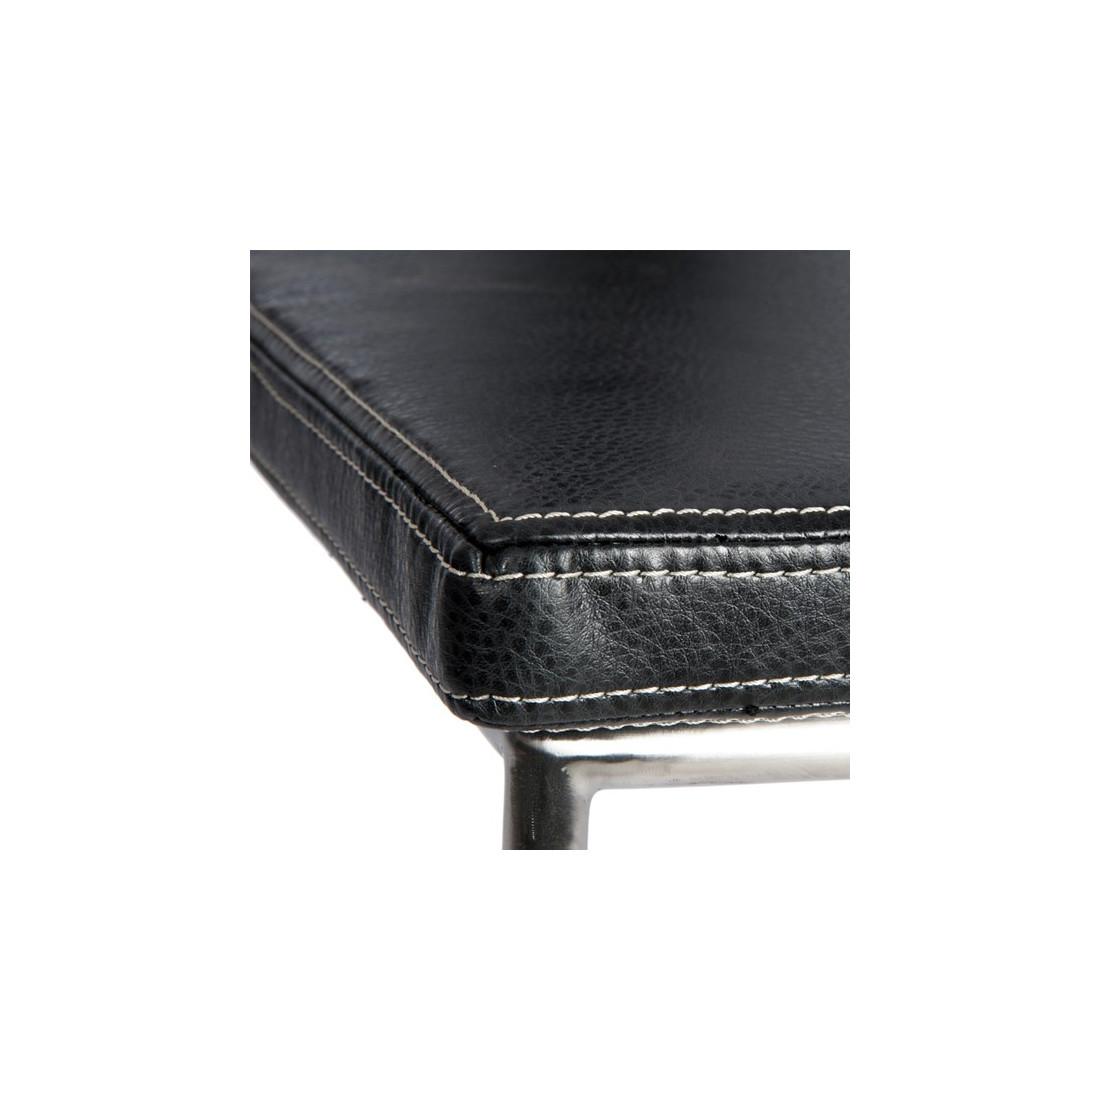 Chaise salle a manger cuir noir maison design for Chaise cuir noir